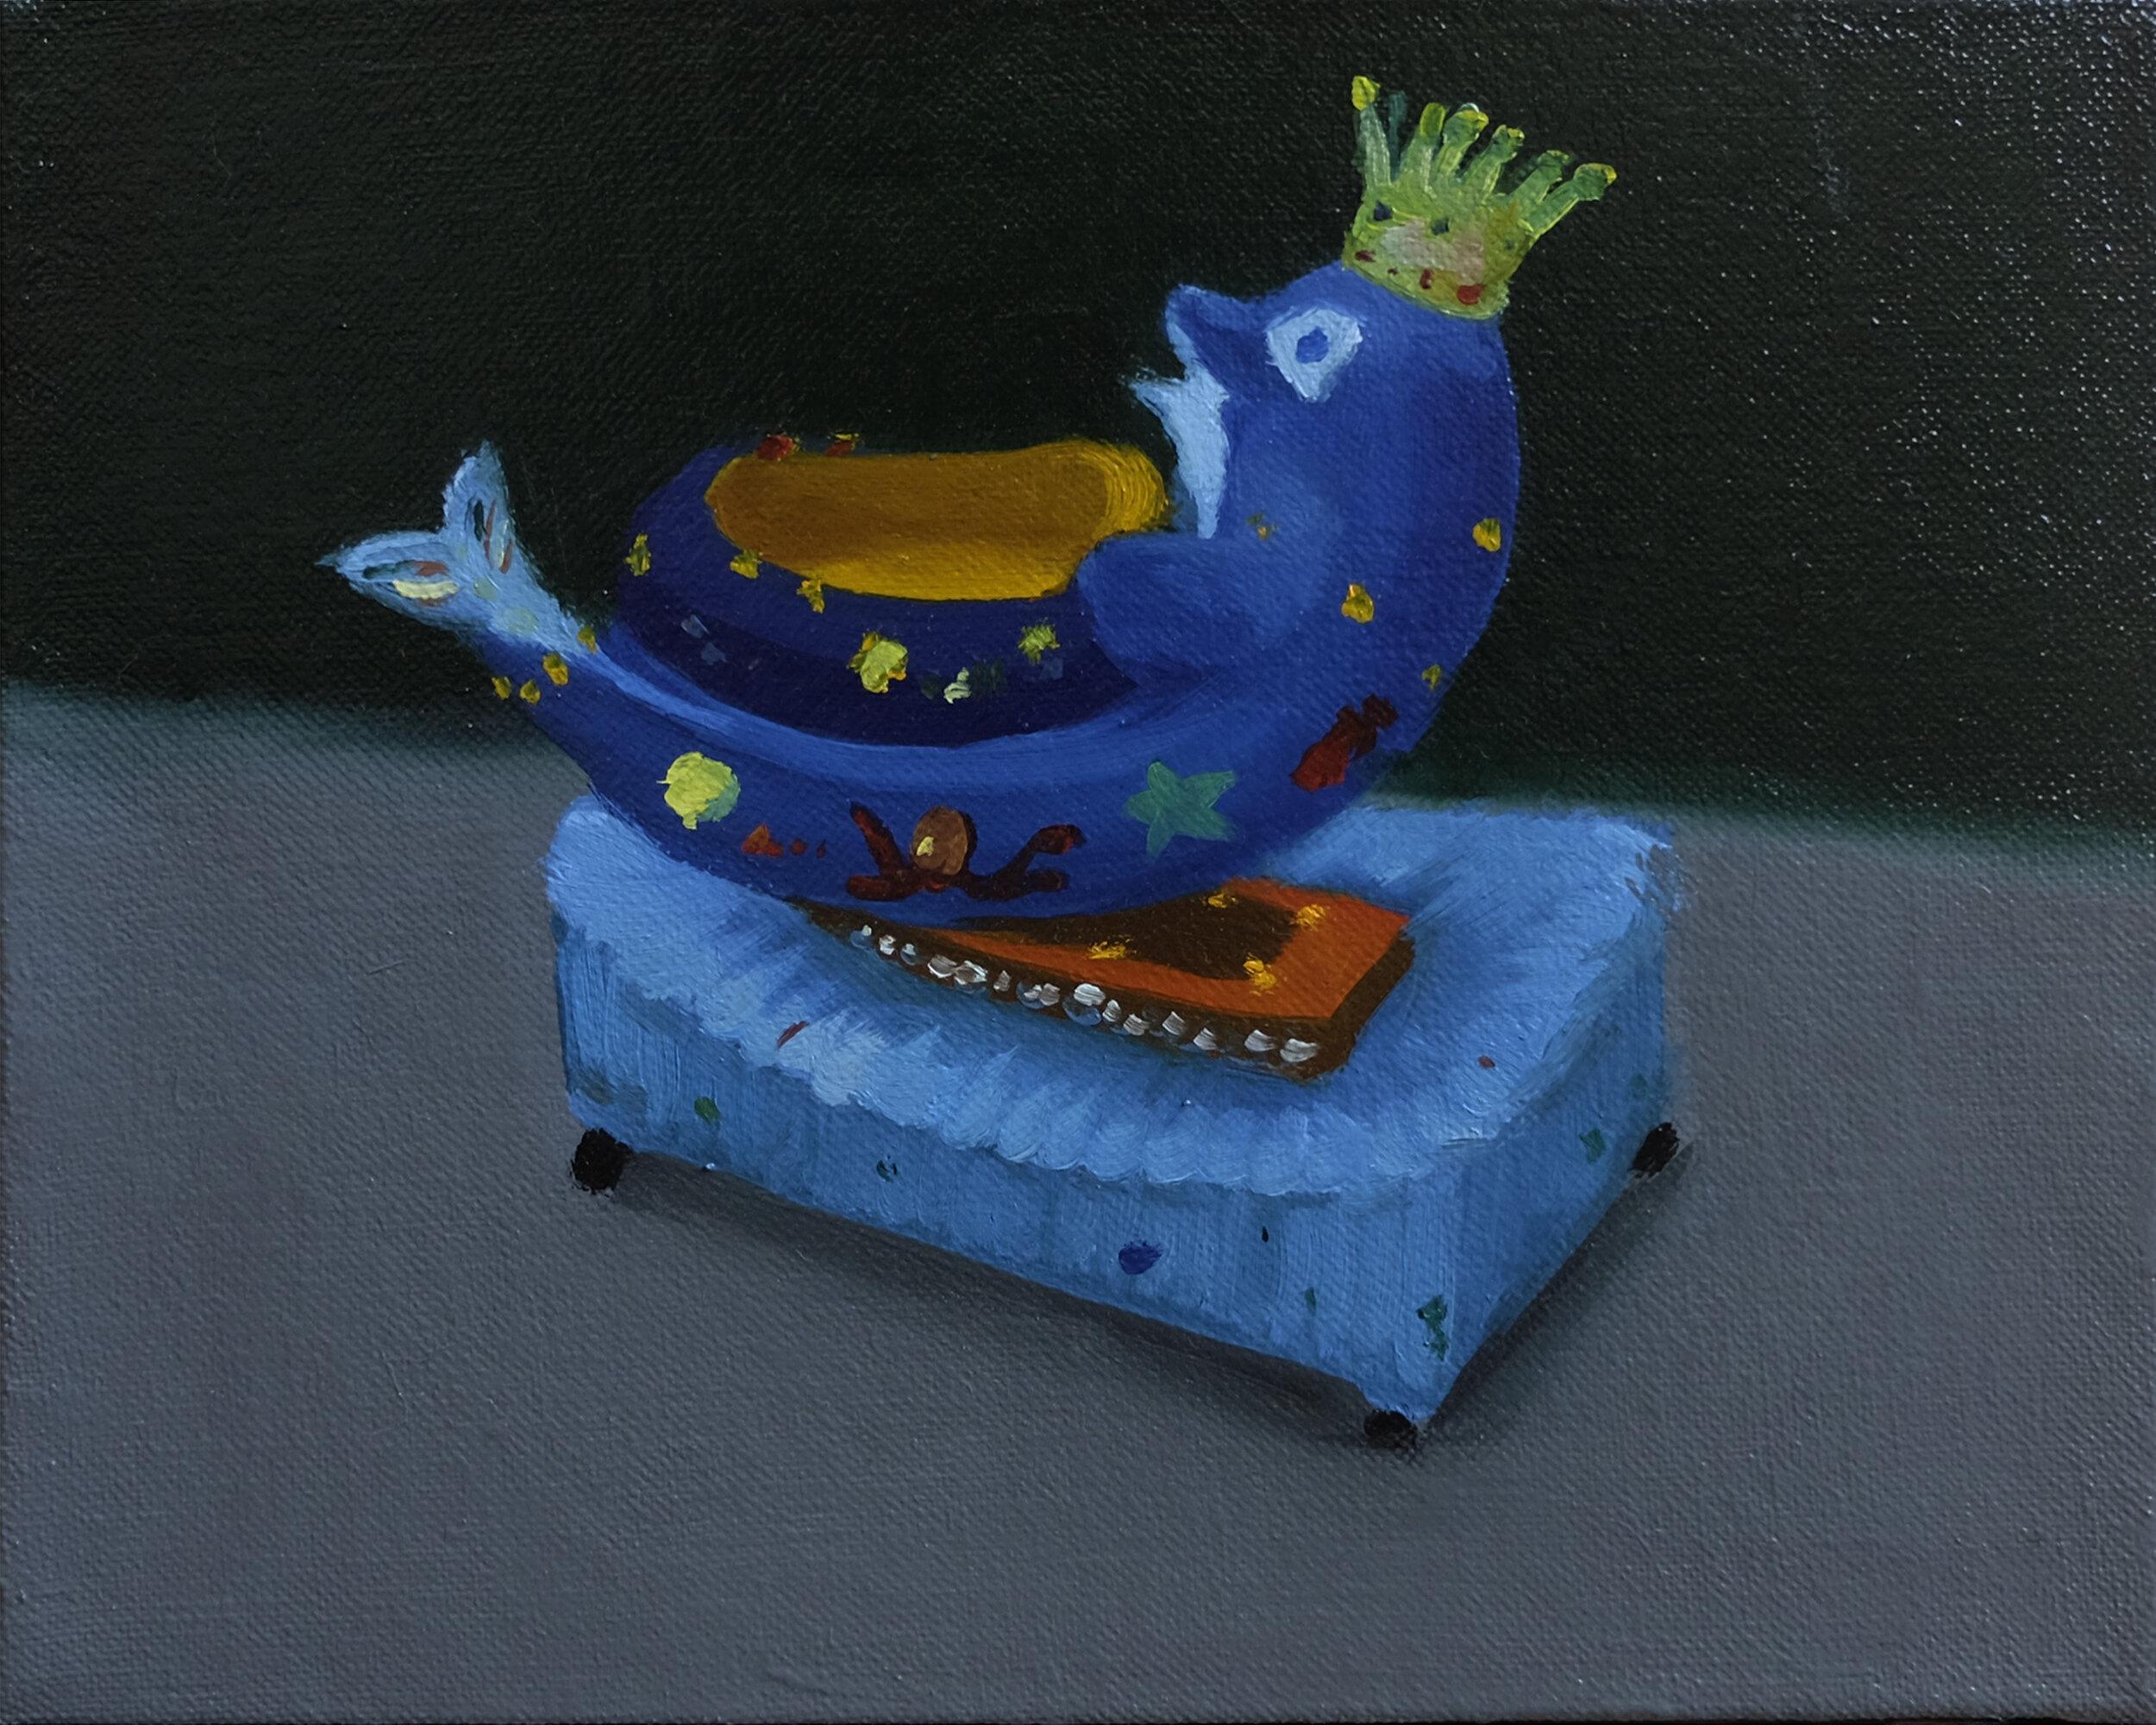 30 x 25 cm  oil on canvas